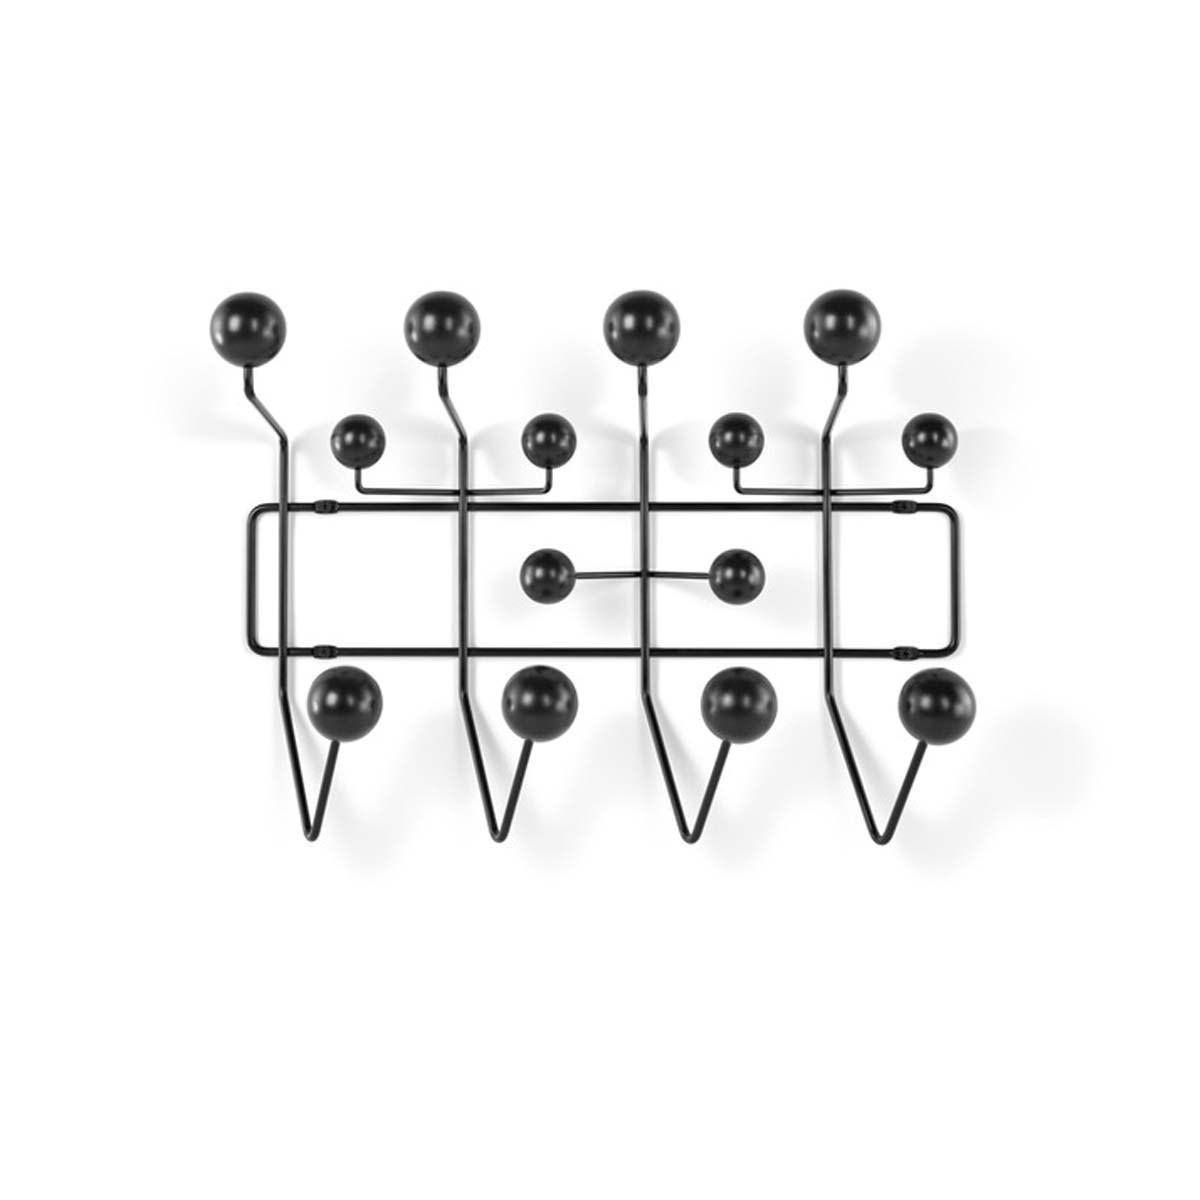 Hermanmiller Eames Hangitall Accessories 1